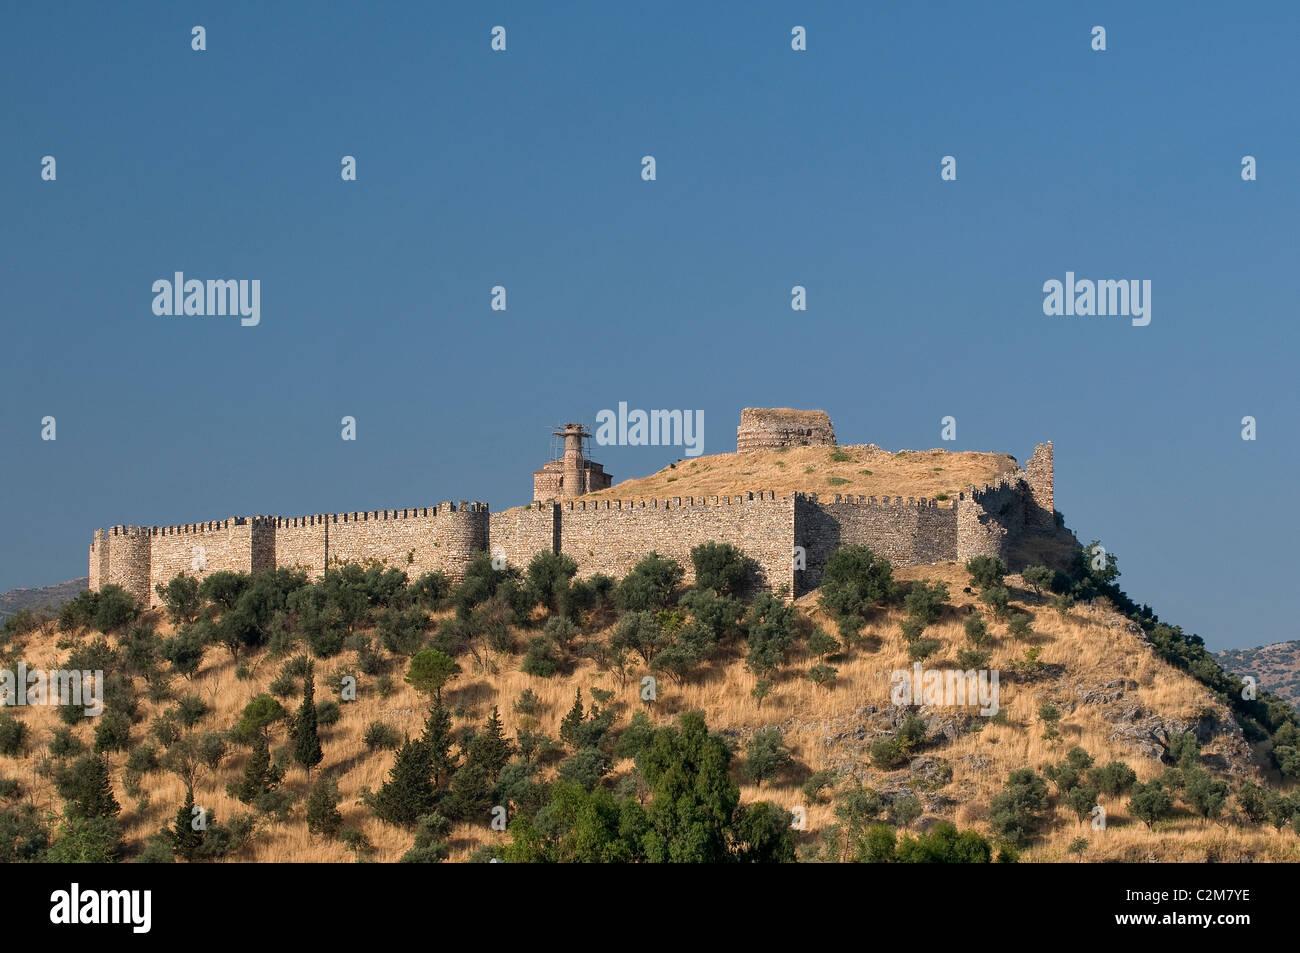 Historische Burg von Selcuk-Izmir-Türkei Stockbild